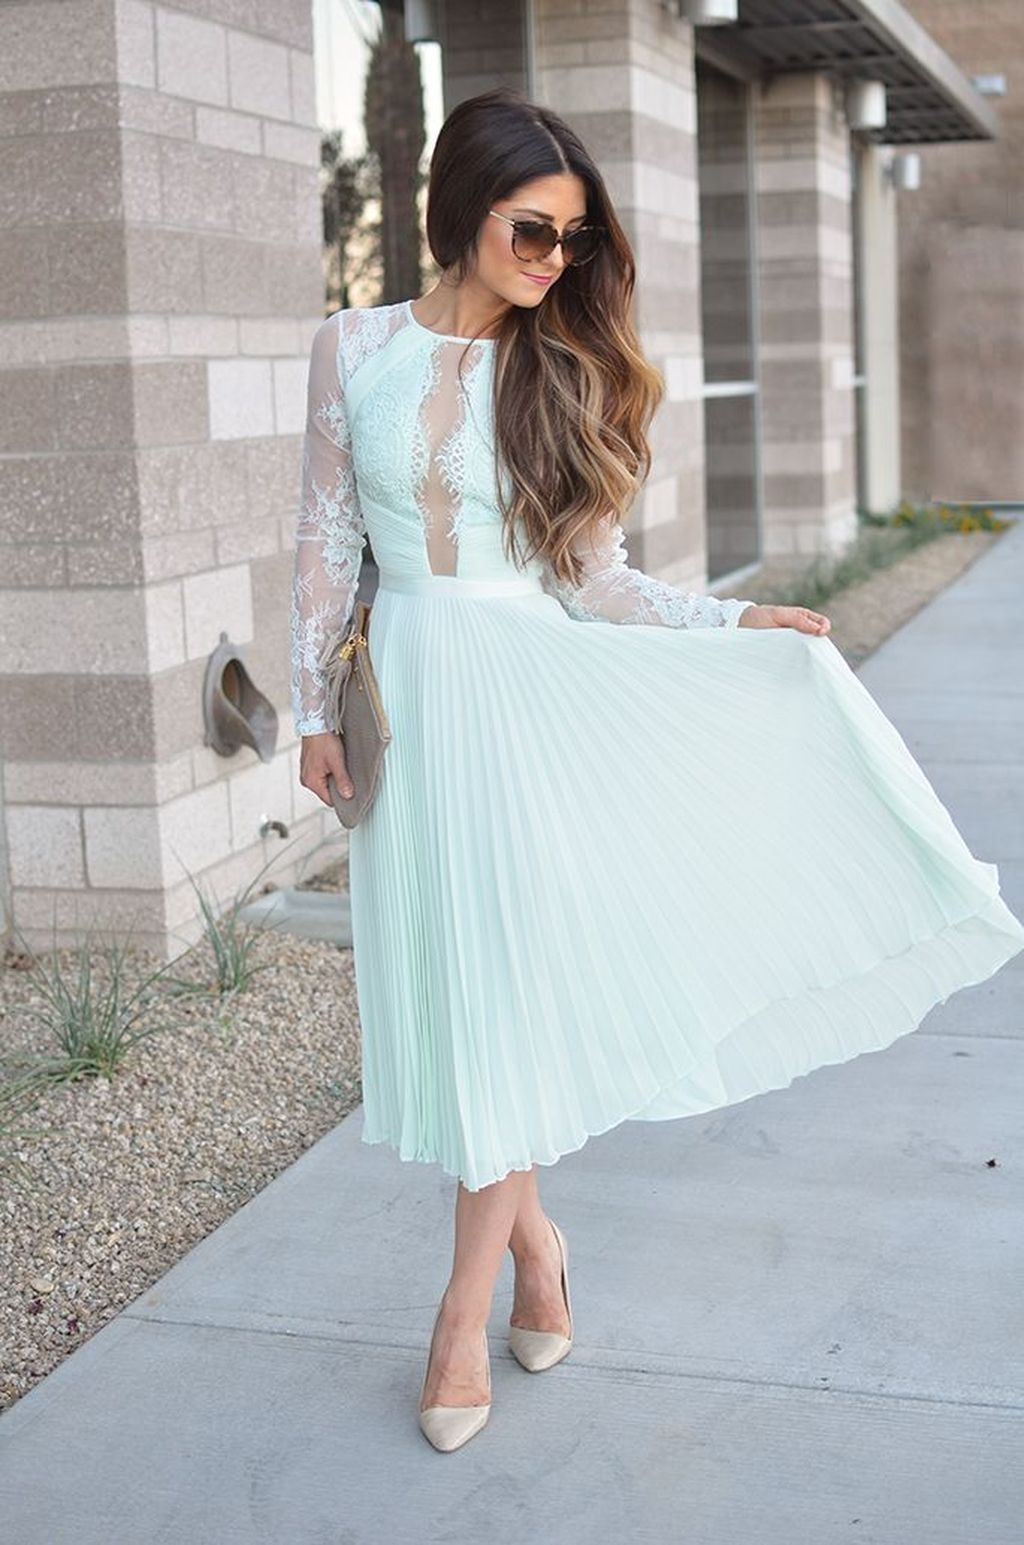 Wedding day guest dresses   Stylish Long Summer Wedding Guest Dresses  φορέματα  Pinterest